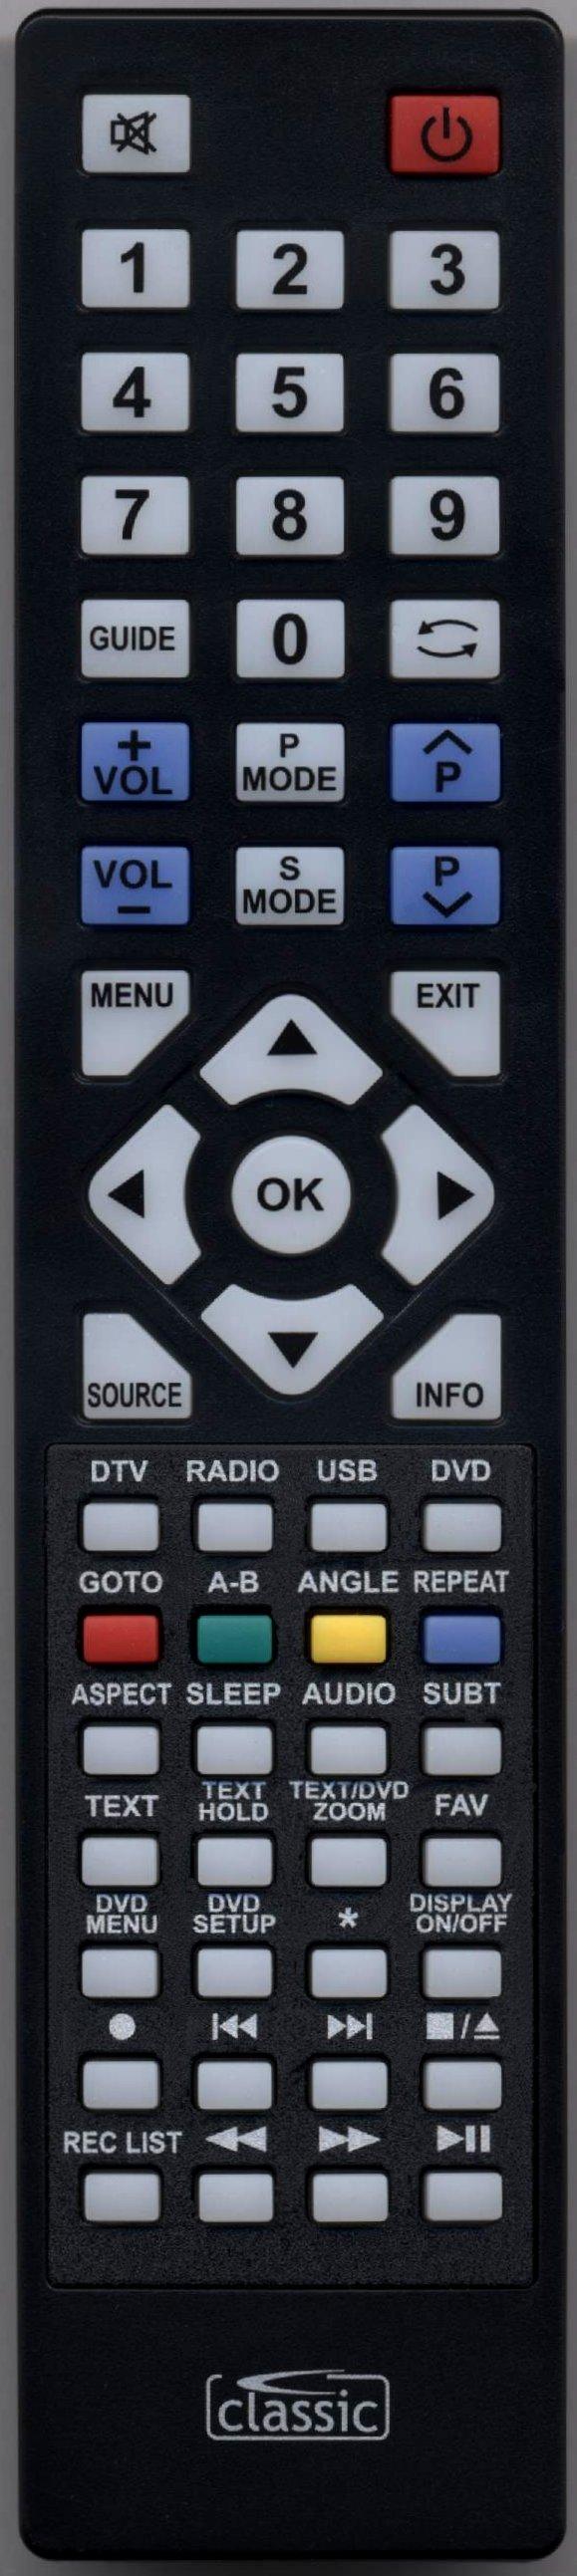 BLAUPUNKT 32/1330 Remote Control